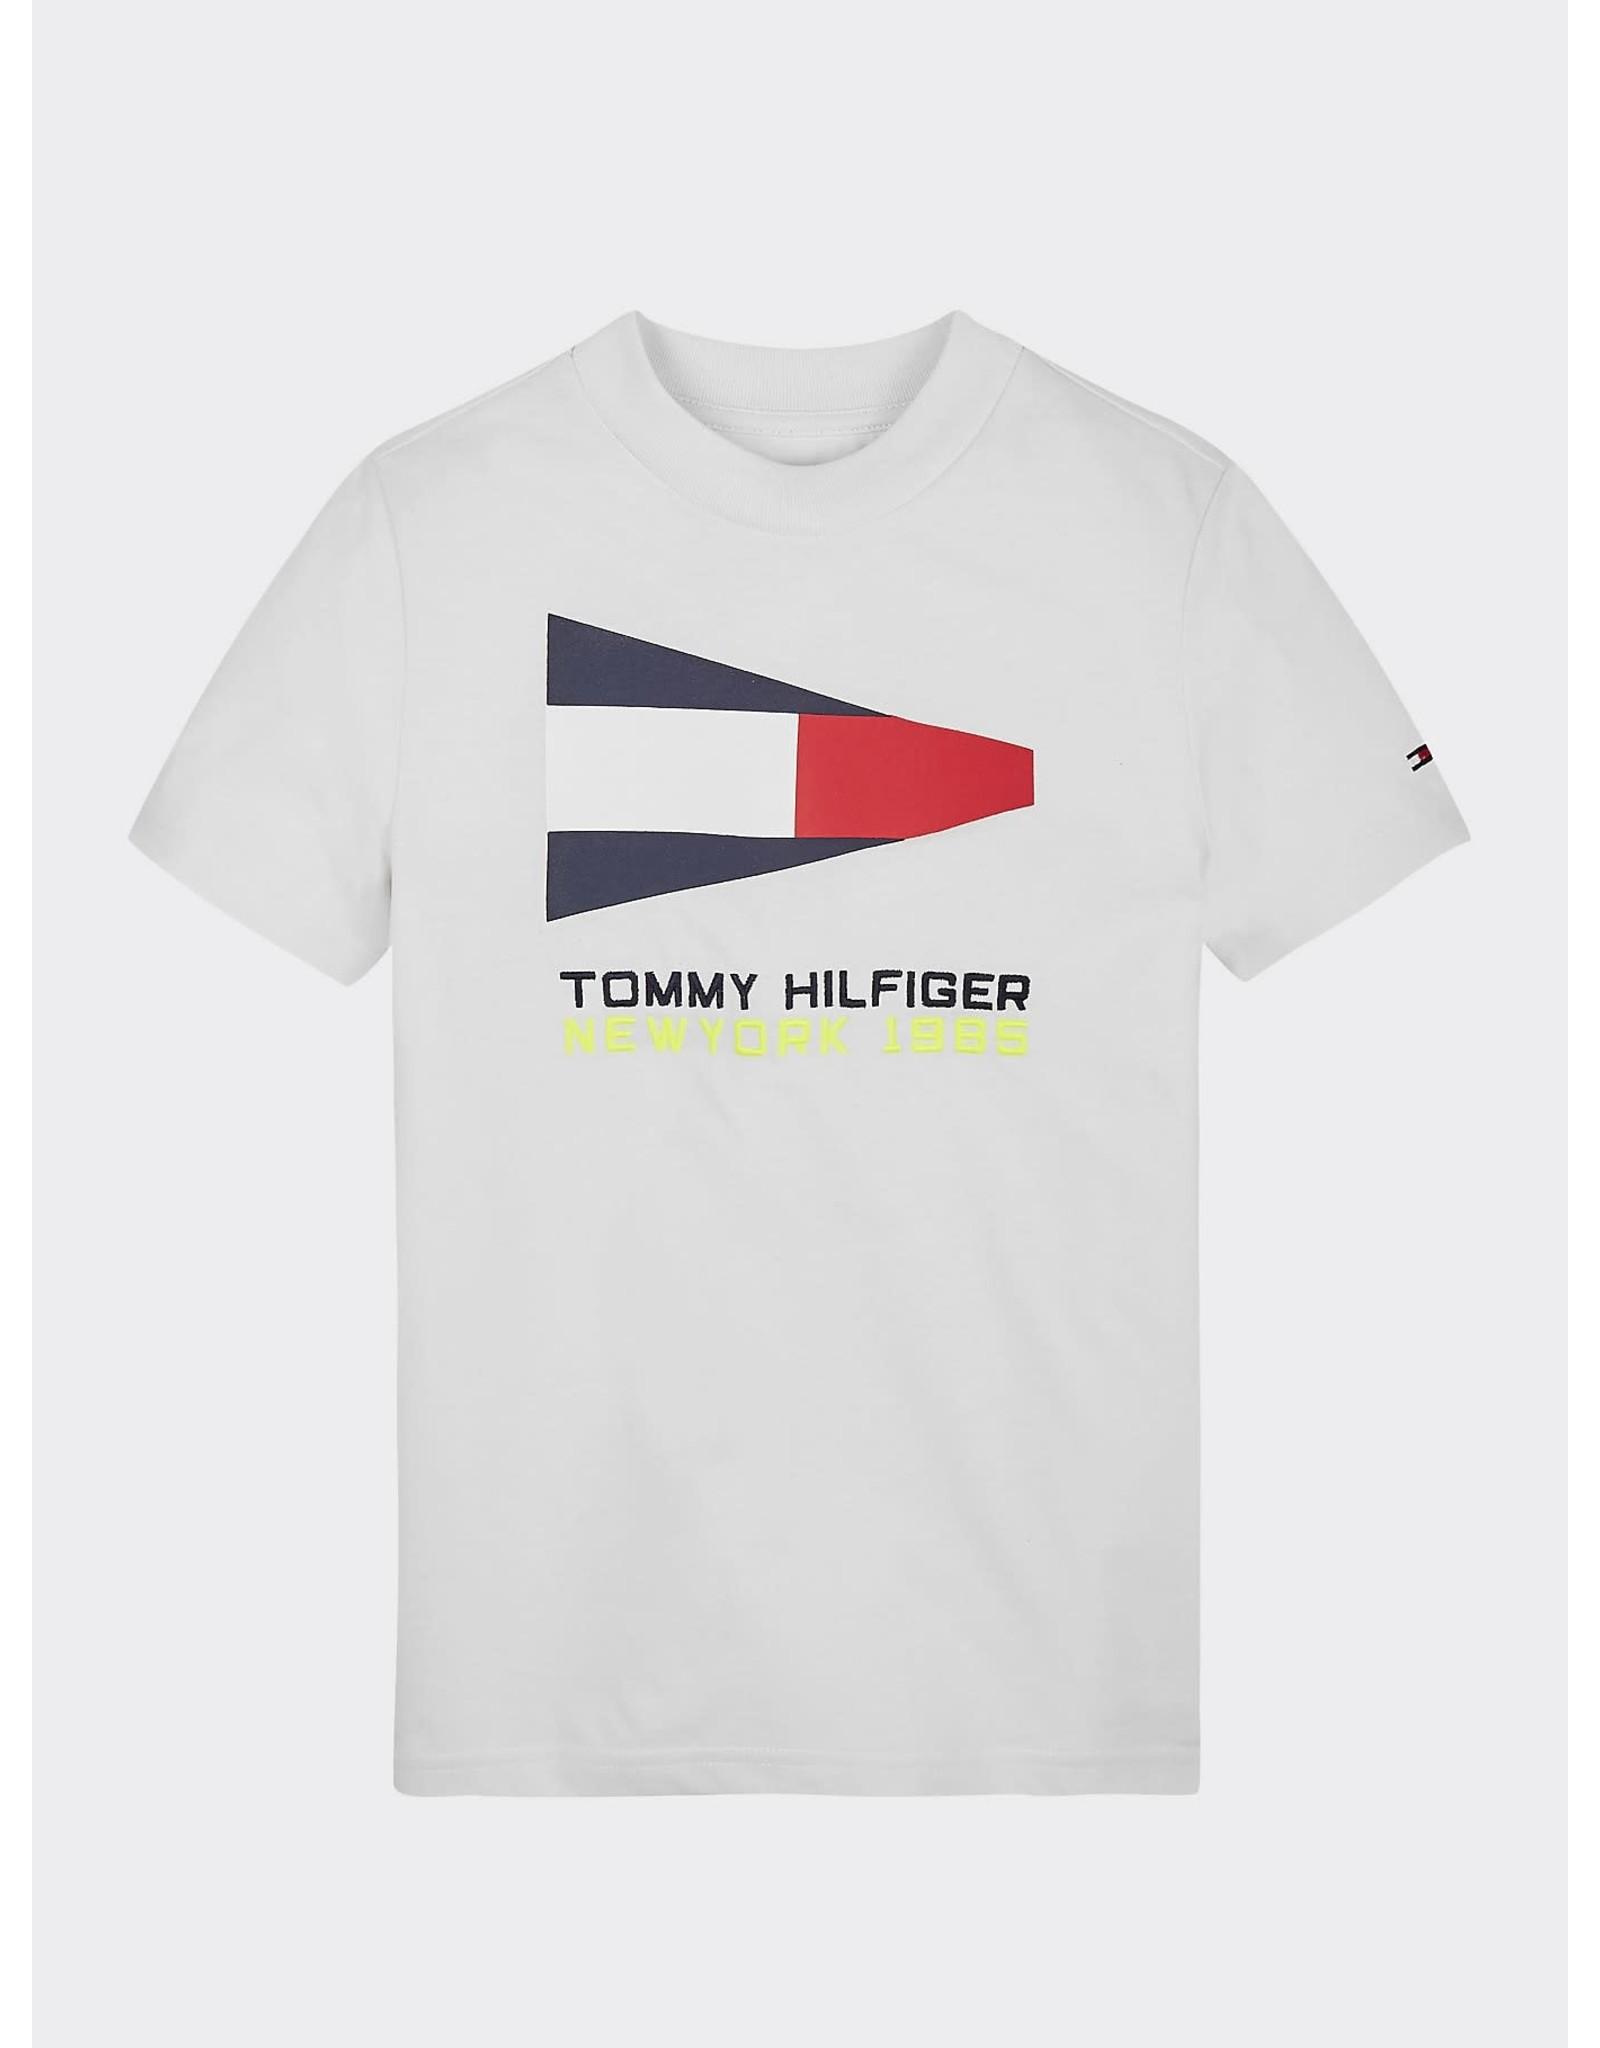 Tommy Hilfiger 5628 T-Shirt